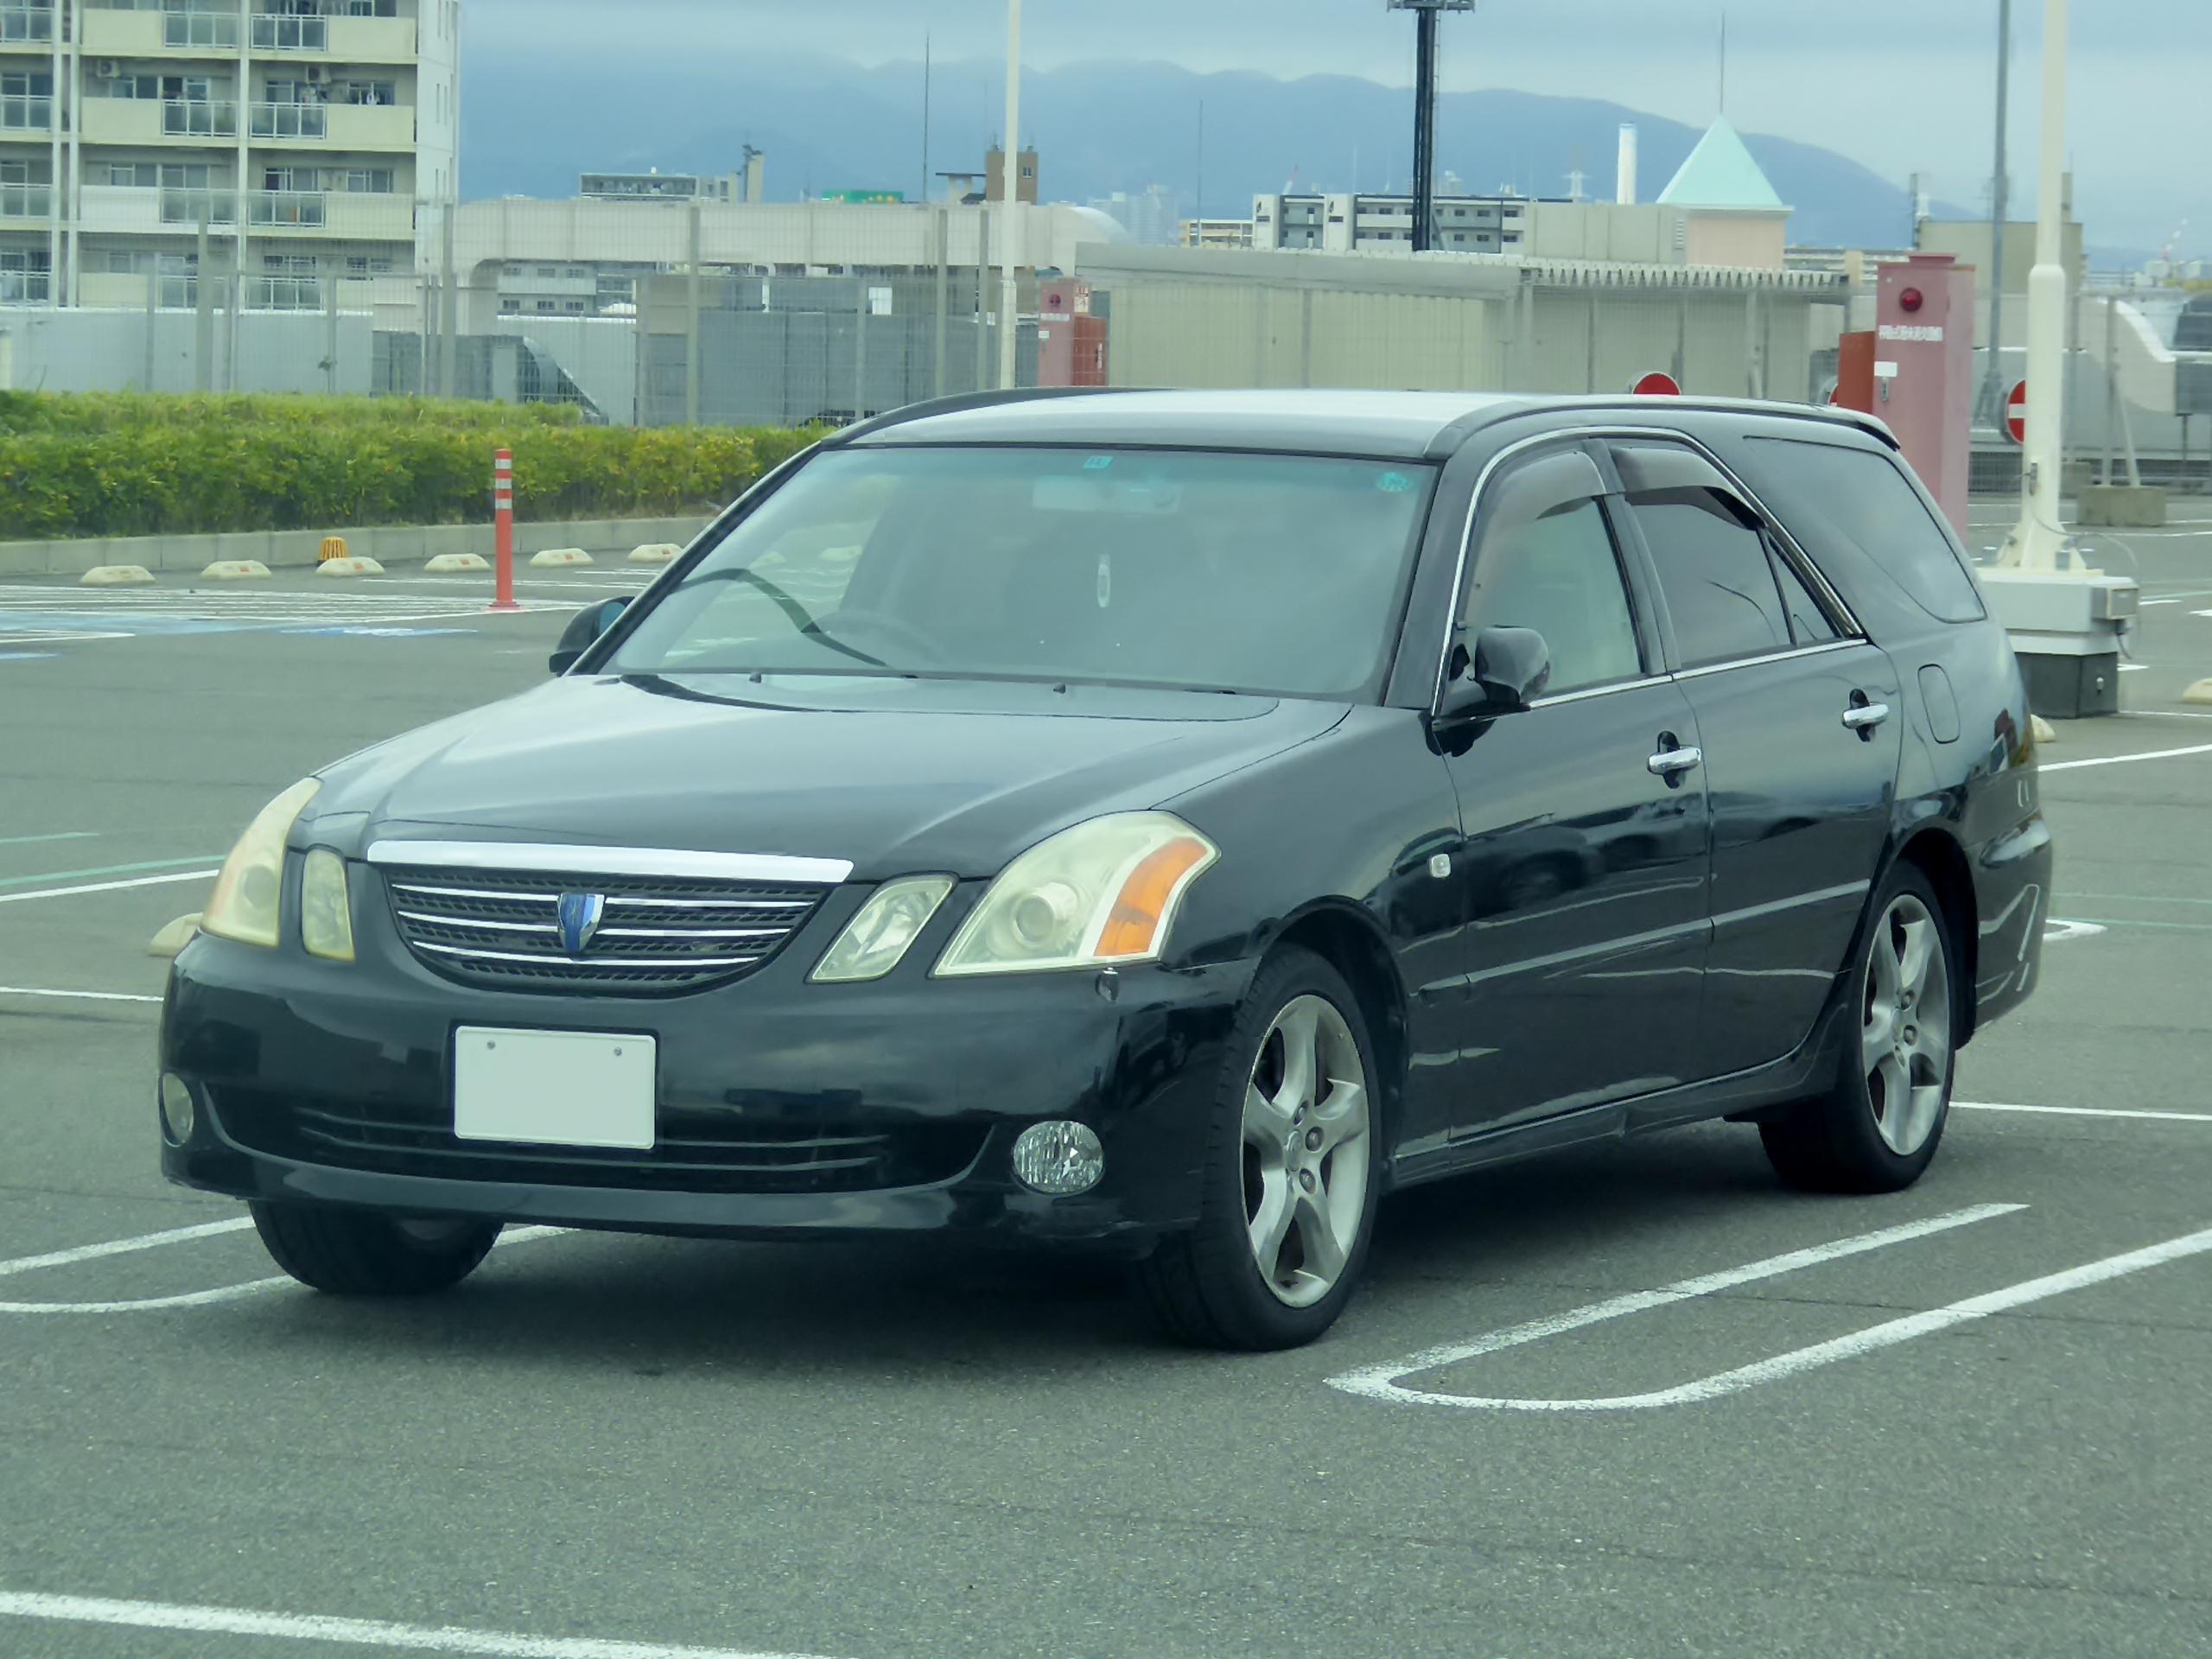 Kekurangan Toyota Mk2 Perbandingan Harga